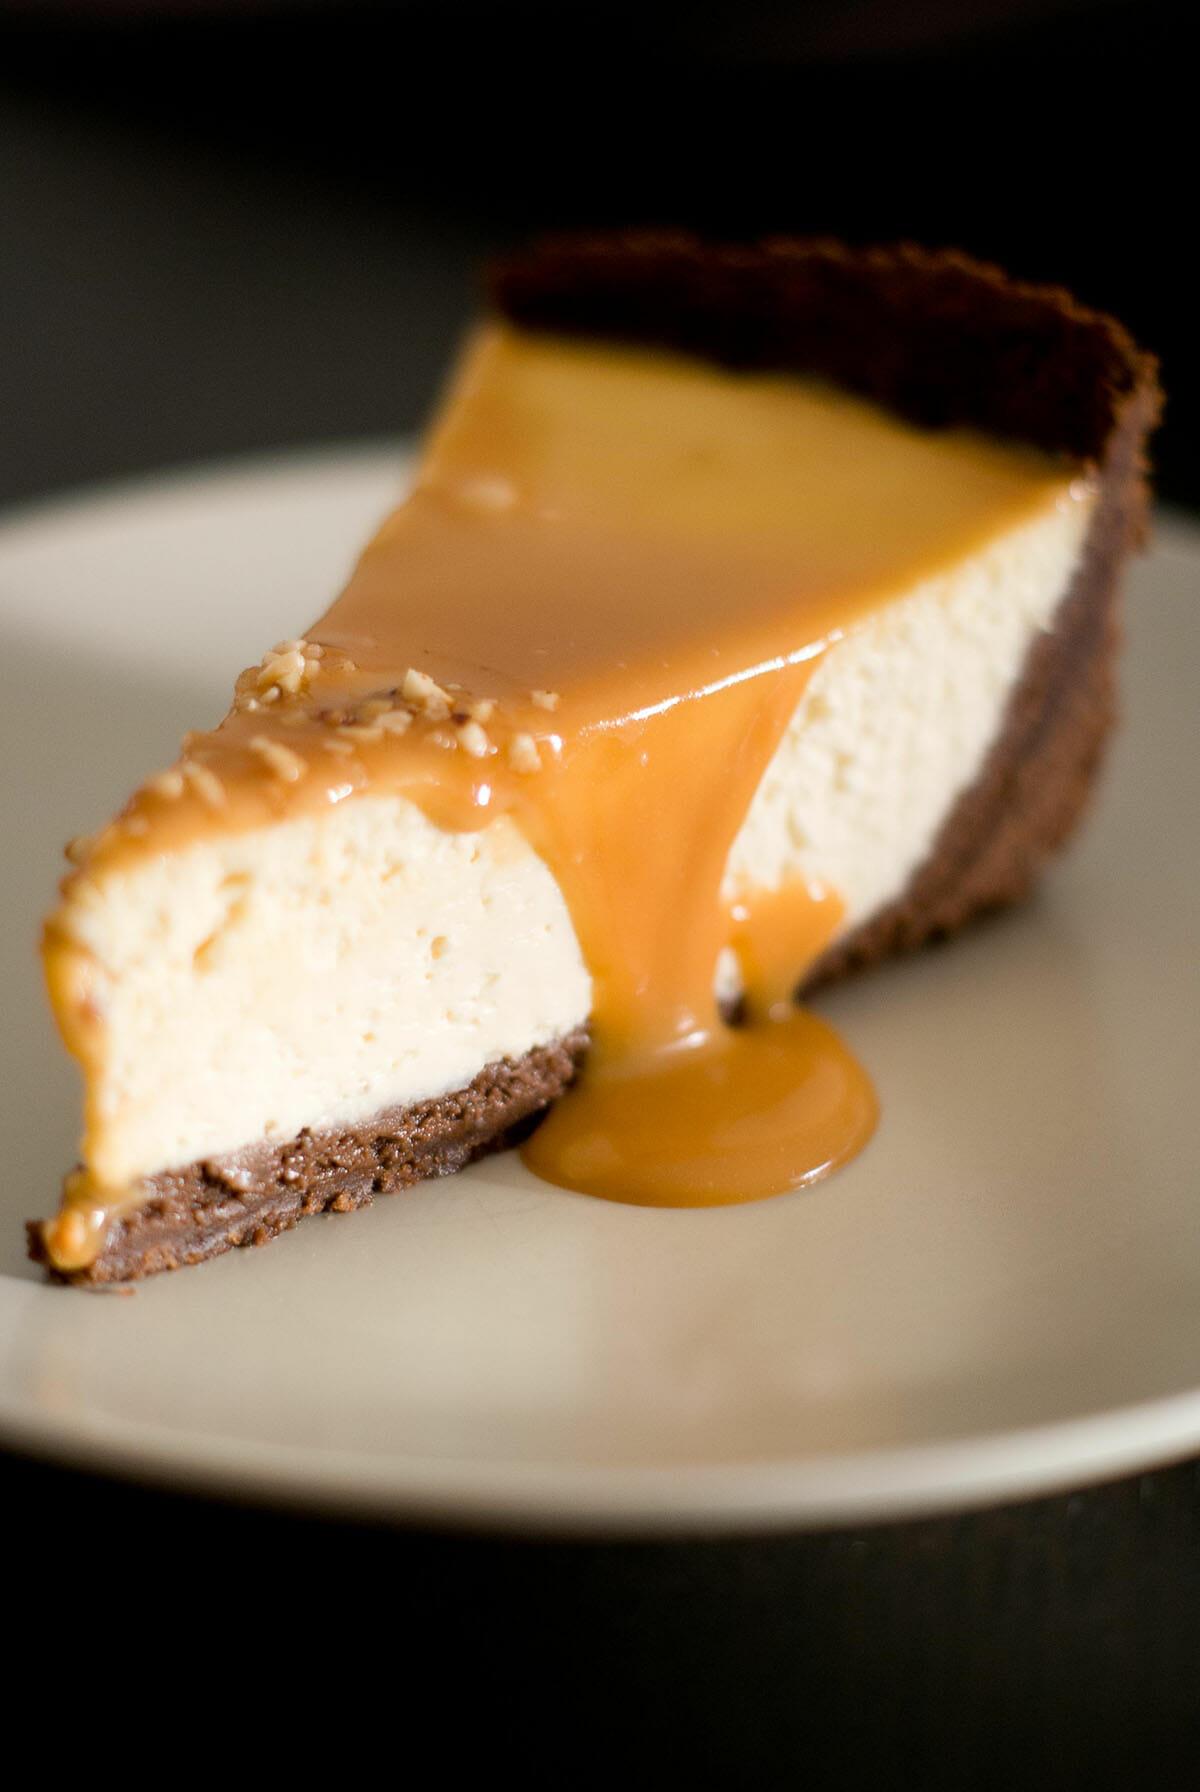 Cheesecake caramel beurre salé part coupée - Lilie Bakery